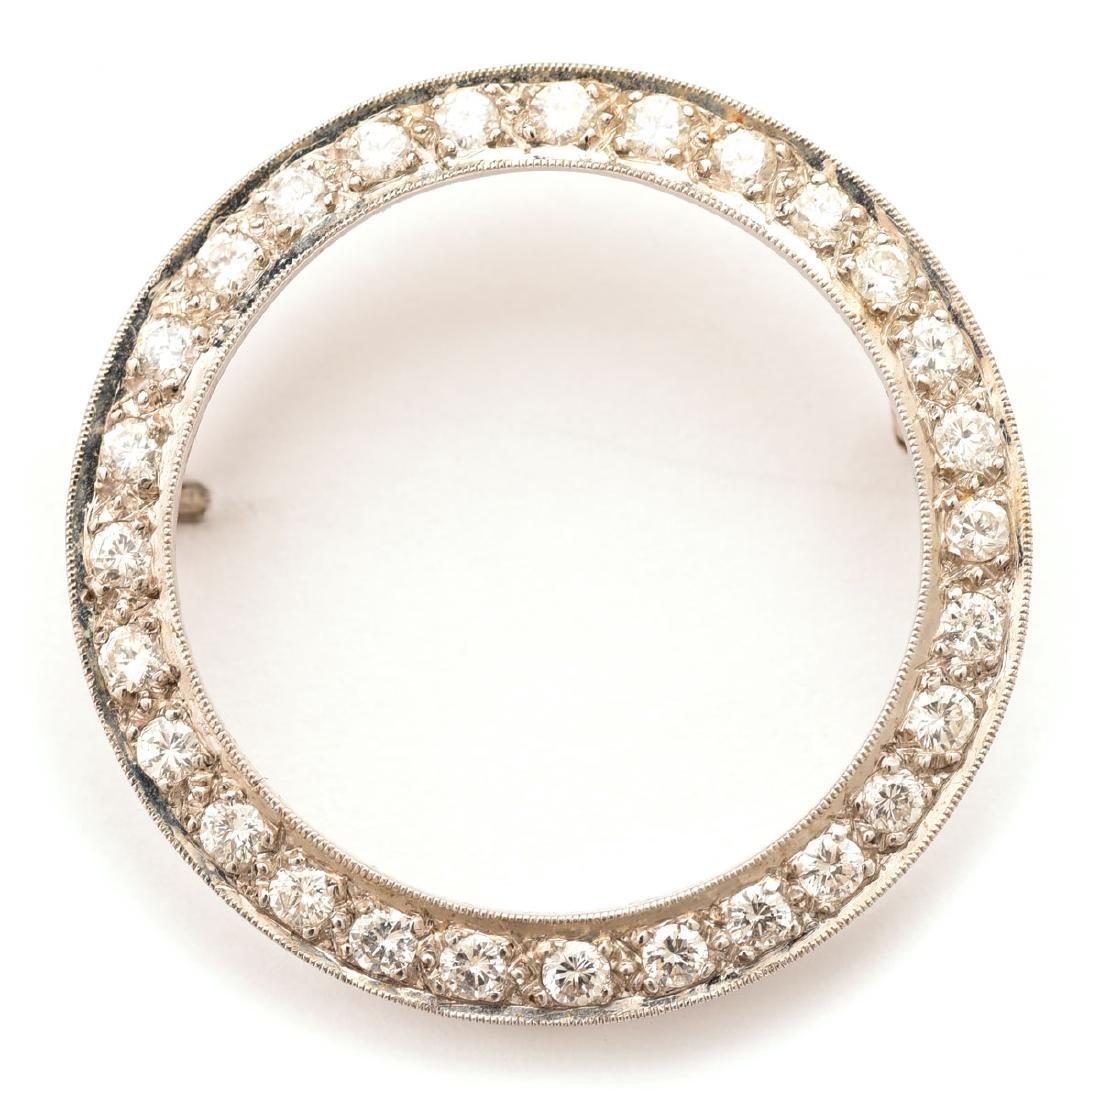 Diamond, 14k White Gold Pin